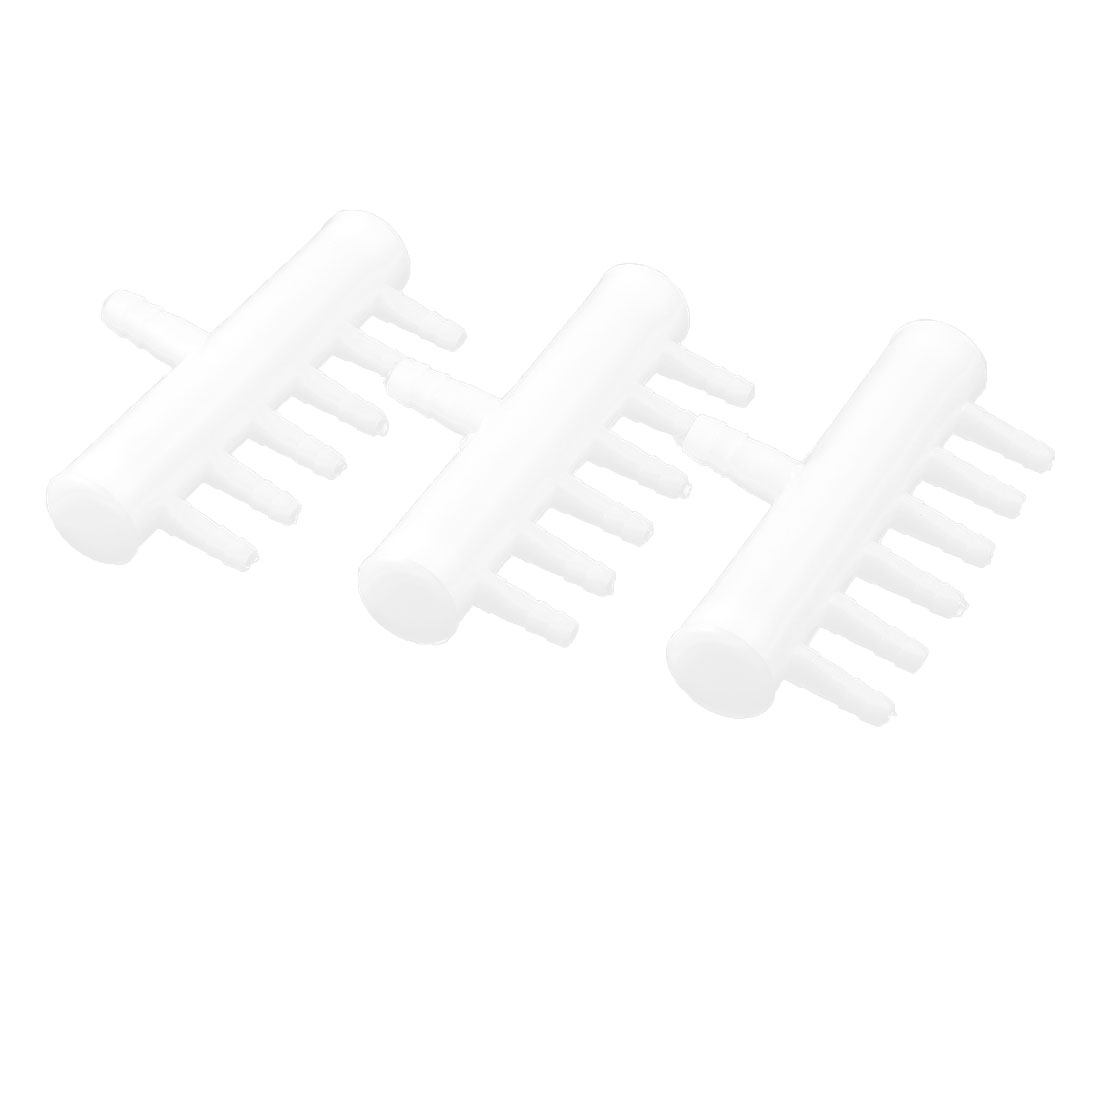 Aquarium Tank Plastic 6 Ways 5mm Tube Connector Air Flow Valve Pump 3pcs